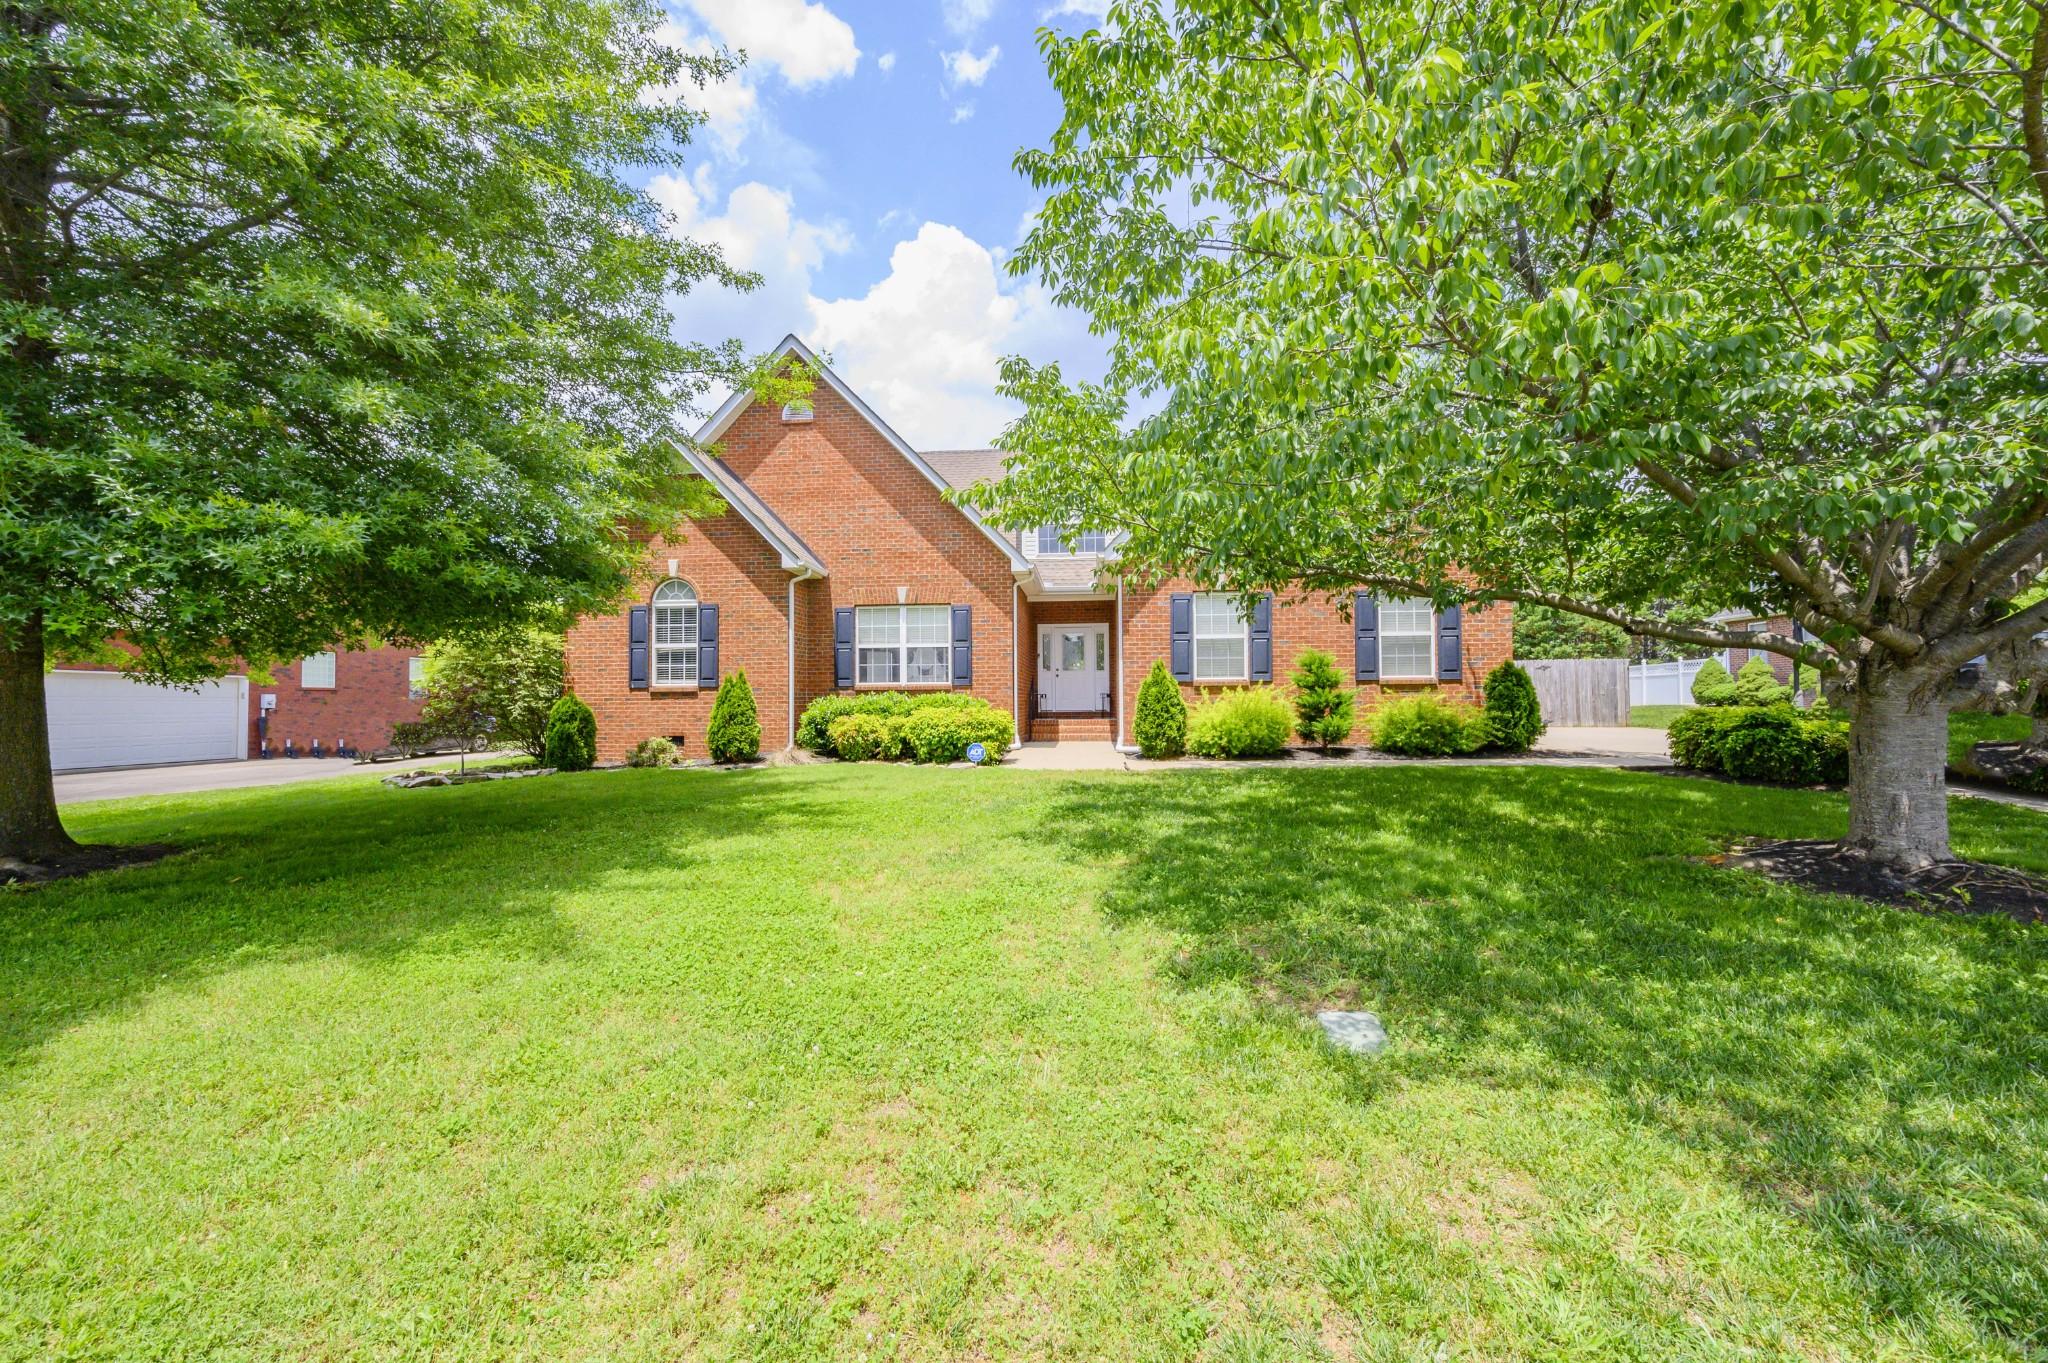 355 Sayre Ln Property Photo - Murfreesboro, TN real estate listing